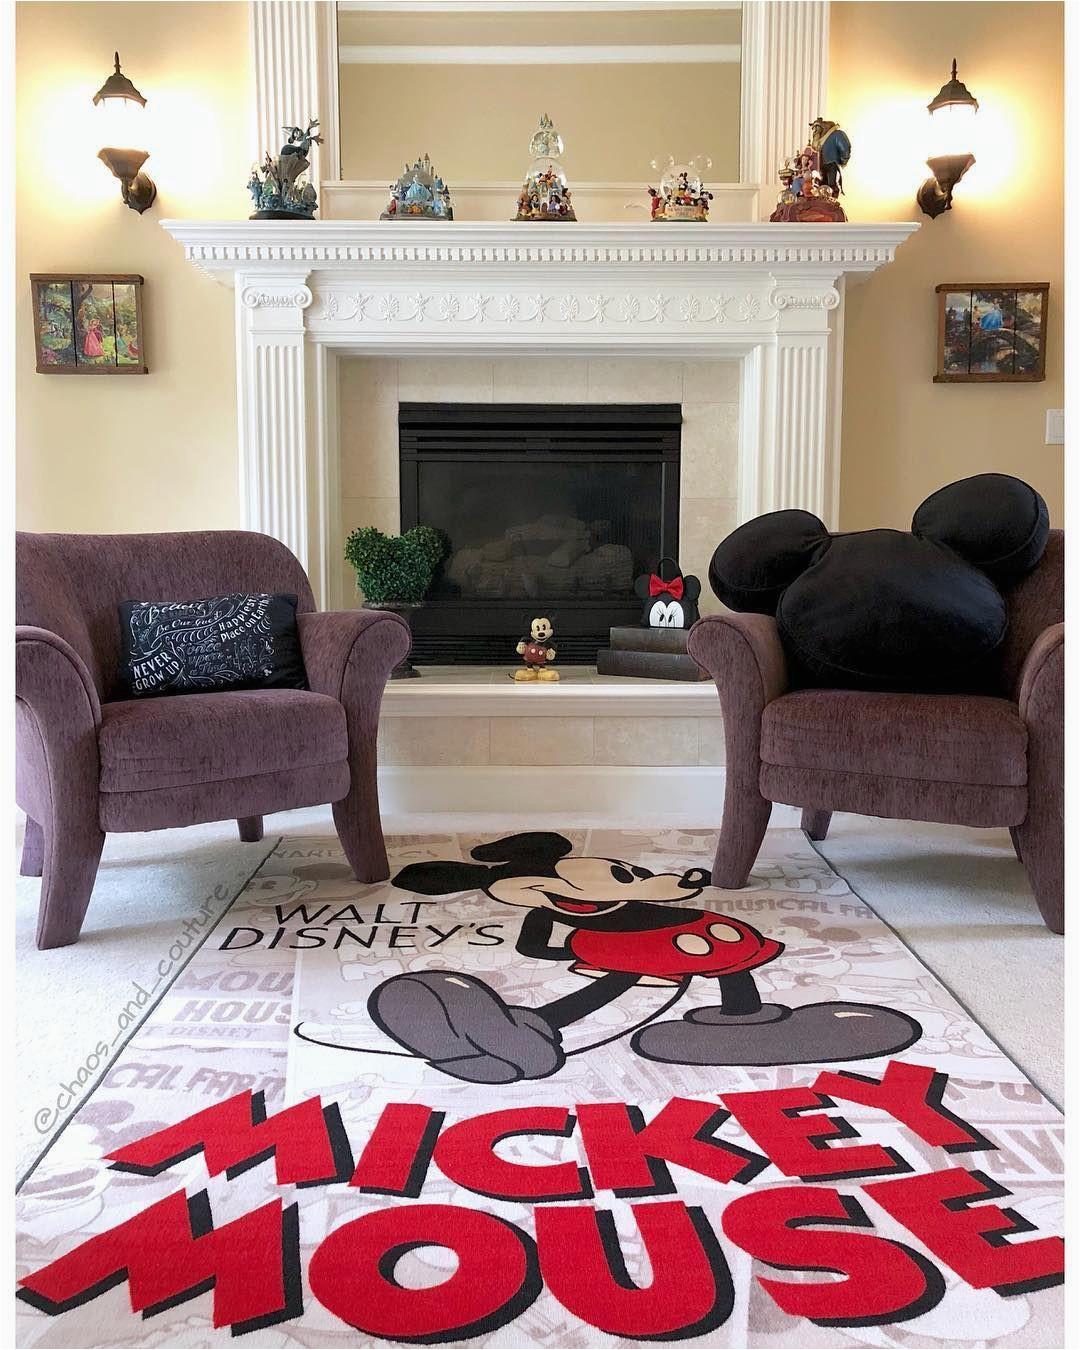 Mickey and Minnie Mouse area Rug Classic Mickey Living Room Disney Home I Disney Decor I